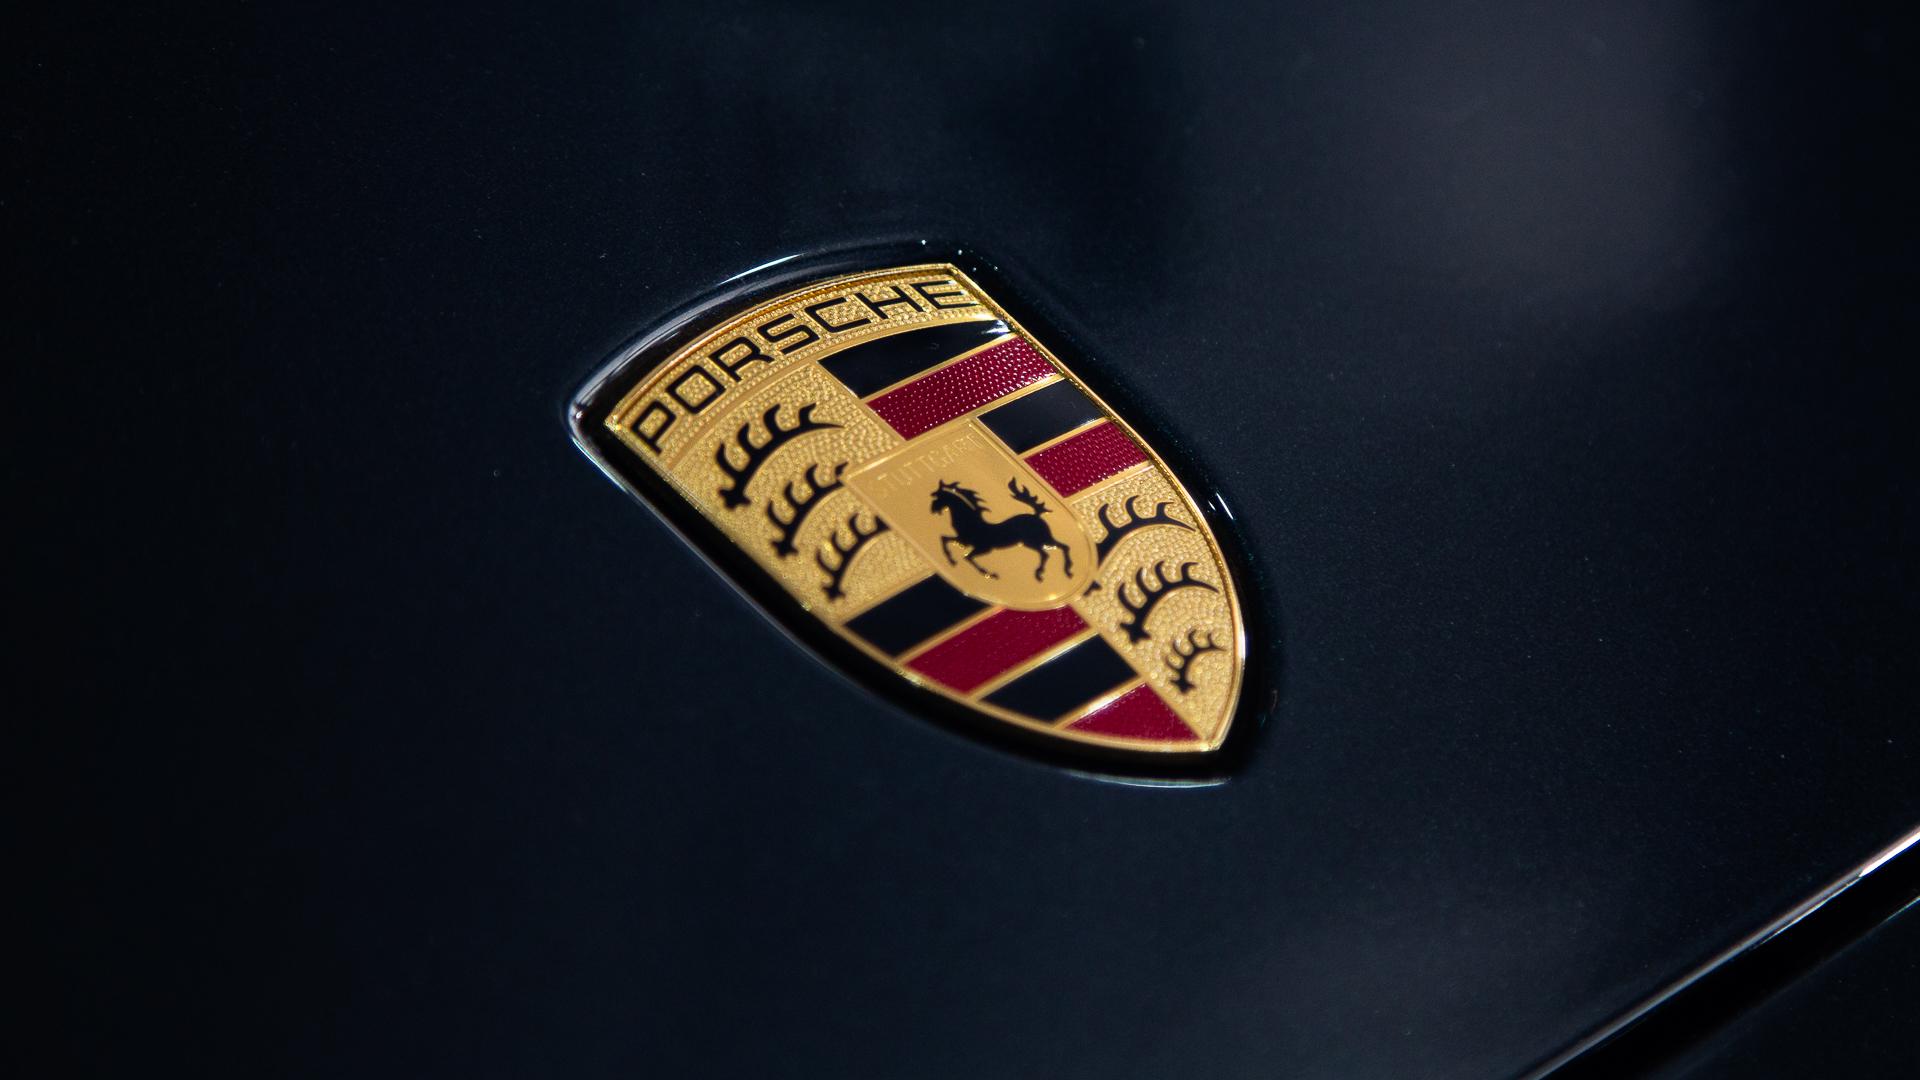 Porsche-Austin-2018-Panamera-13.jpg